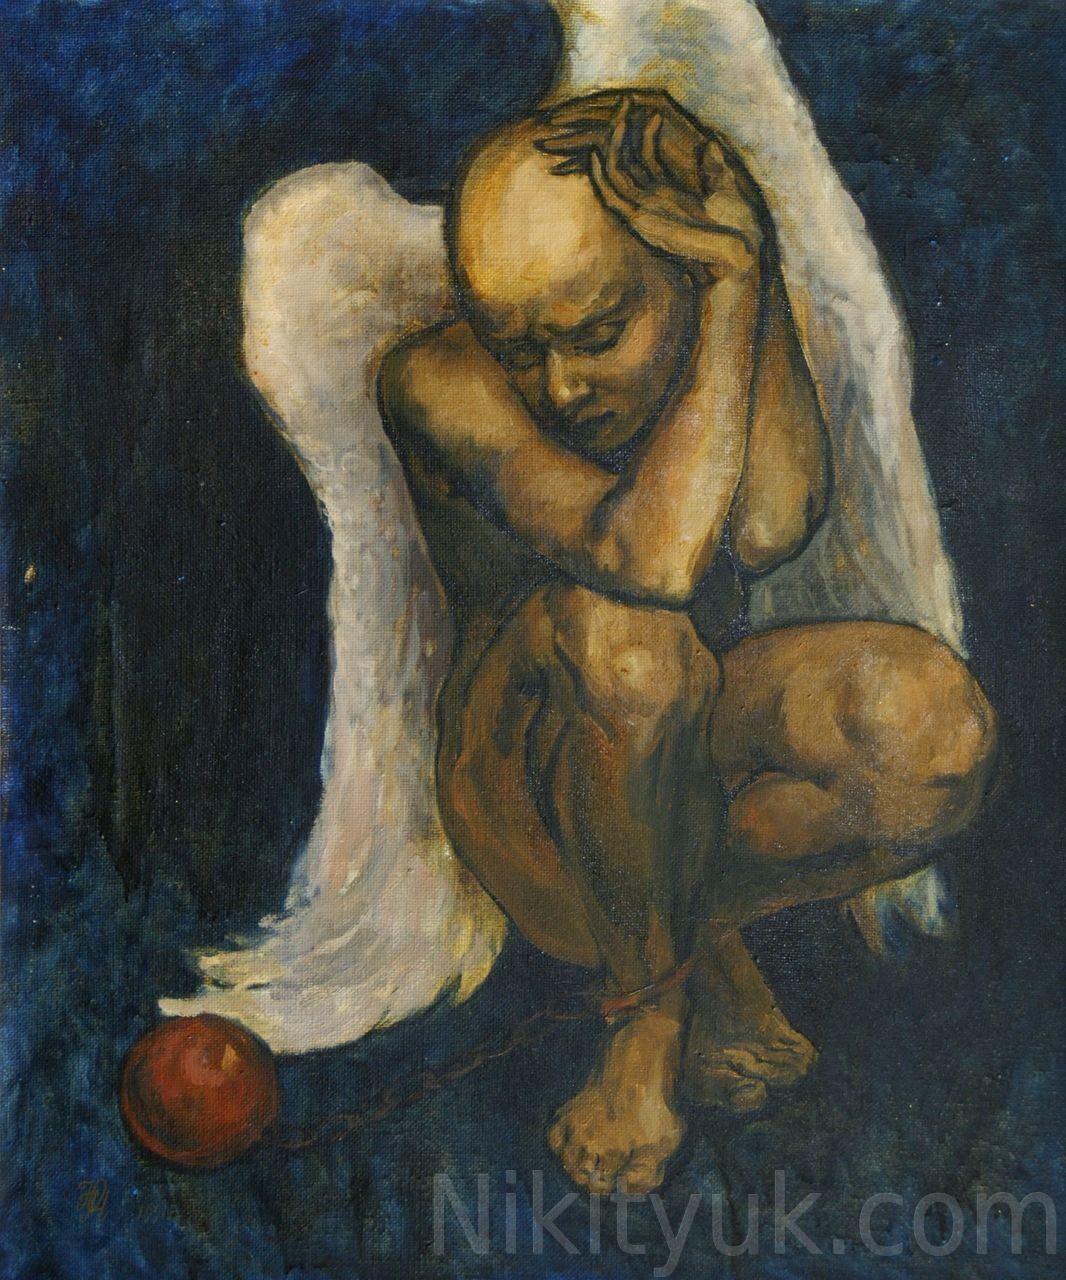 Мой бедный ангел, х.м., 60х50см, 1991г. 30 000 руб. в наличии